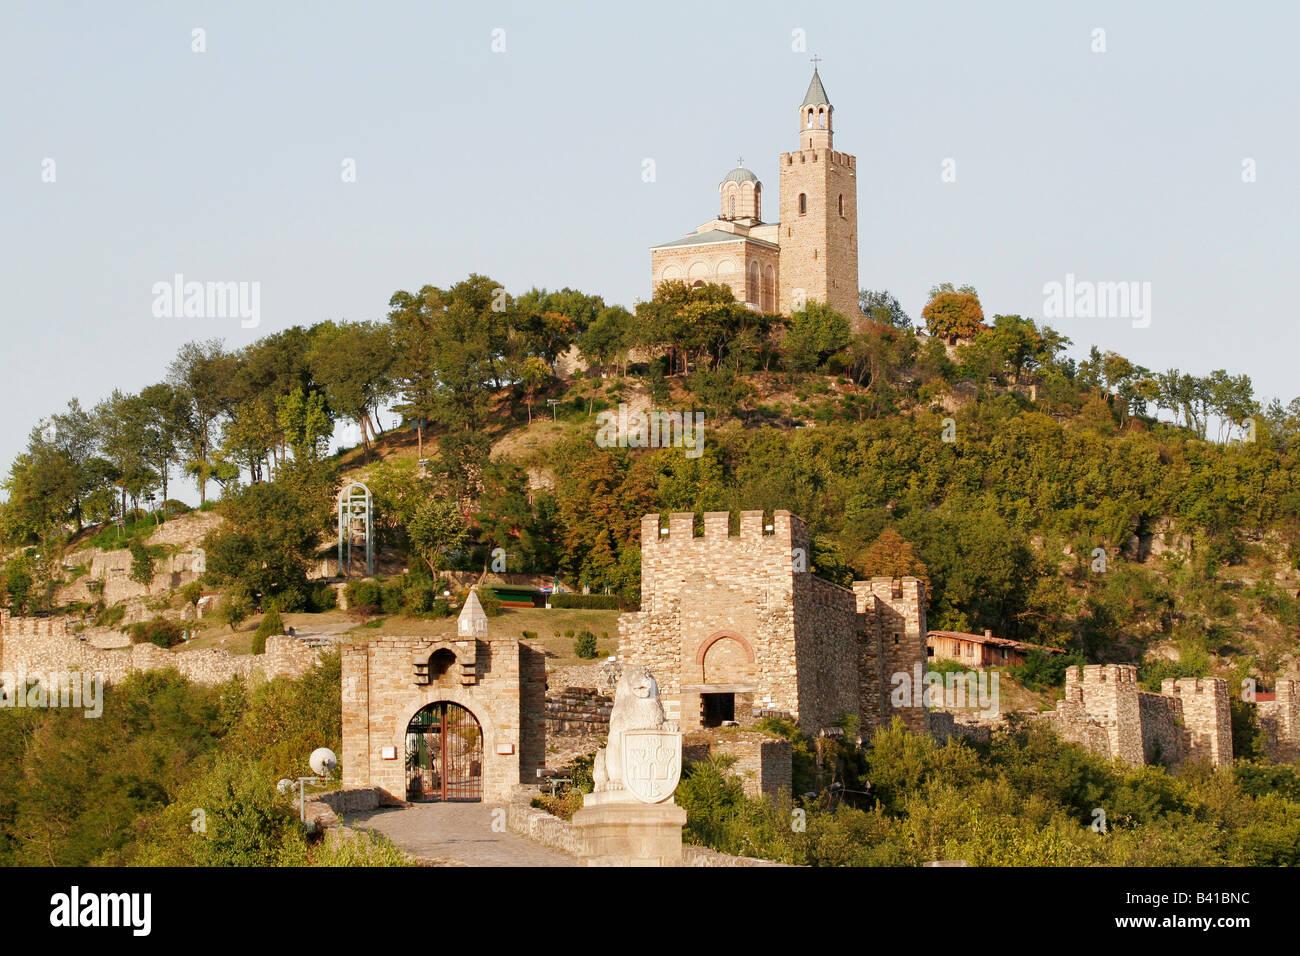 Tsarevets  fortress in Veliko Tarnovo, the former capital of Bulgaria Stock Photo